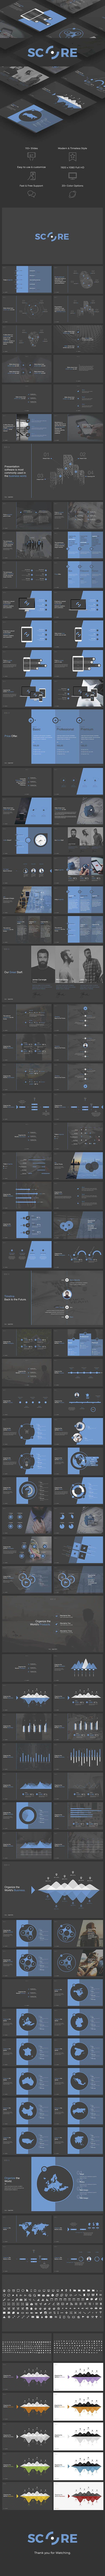 Score PowerPoint Template. Download here: http://graphicriver.net/item/score-powerpoint/15733012?ref=ksioks